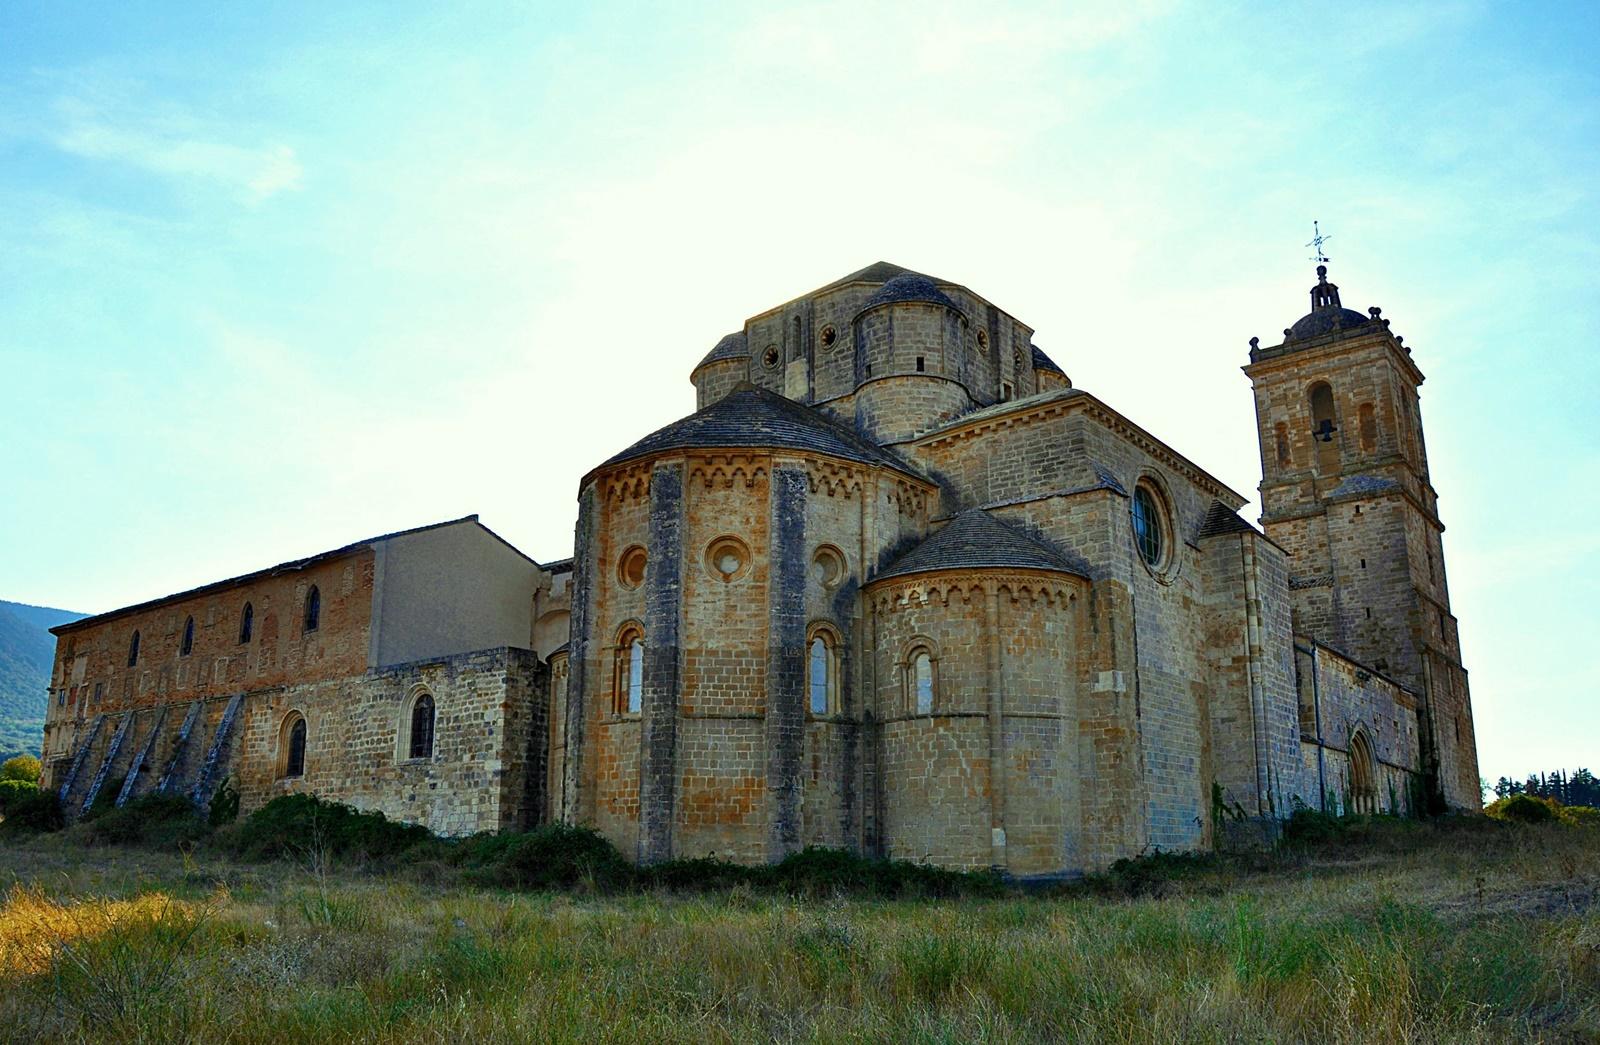 4. Monasterio de Irache, Navarra, antiguo hospital de peregrinos. Autor, Canduela